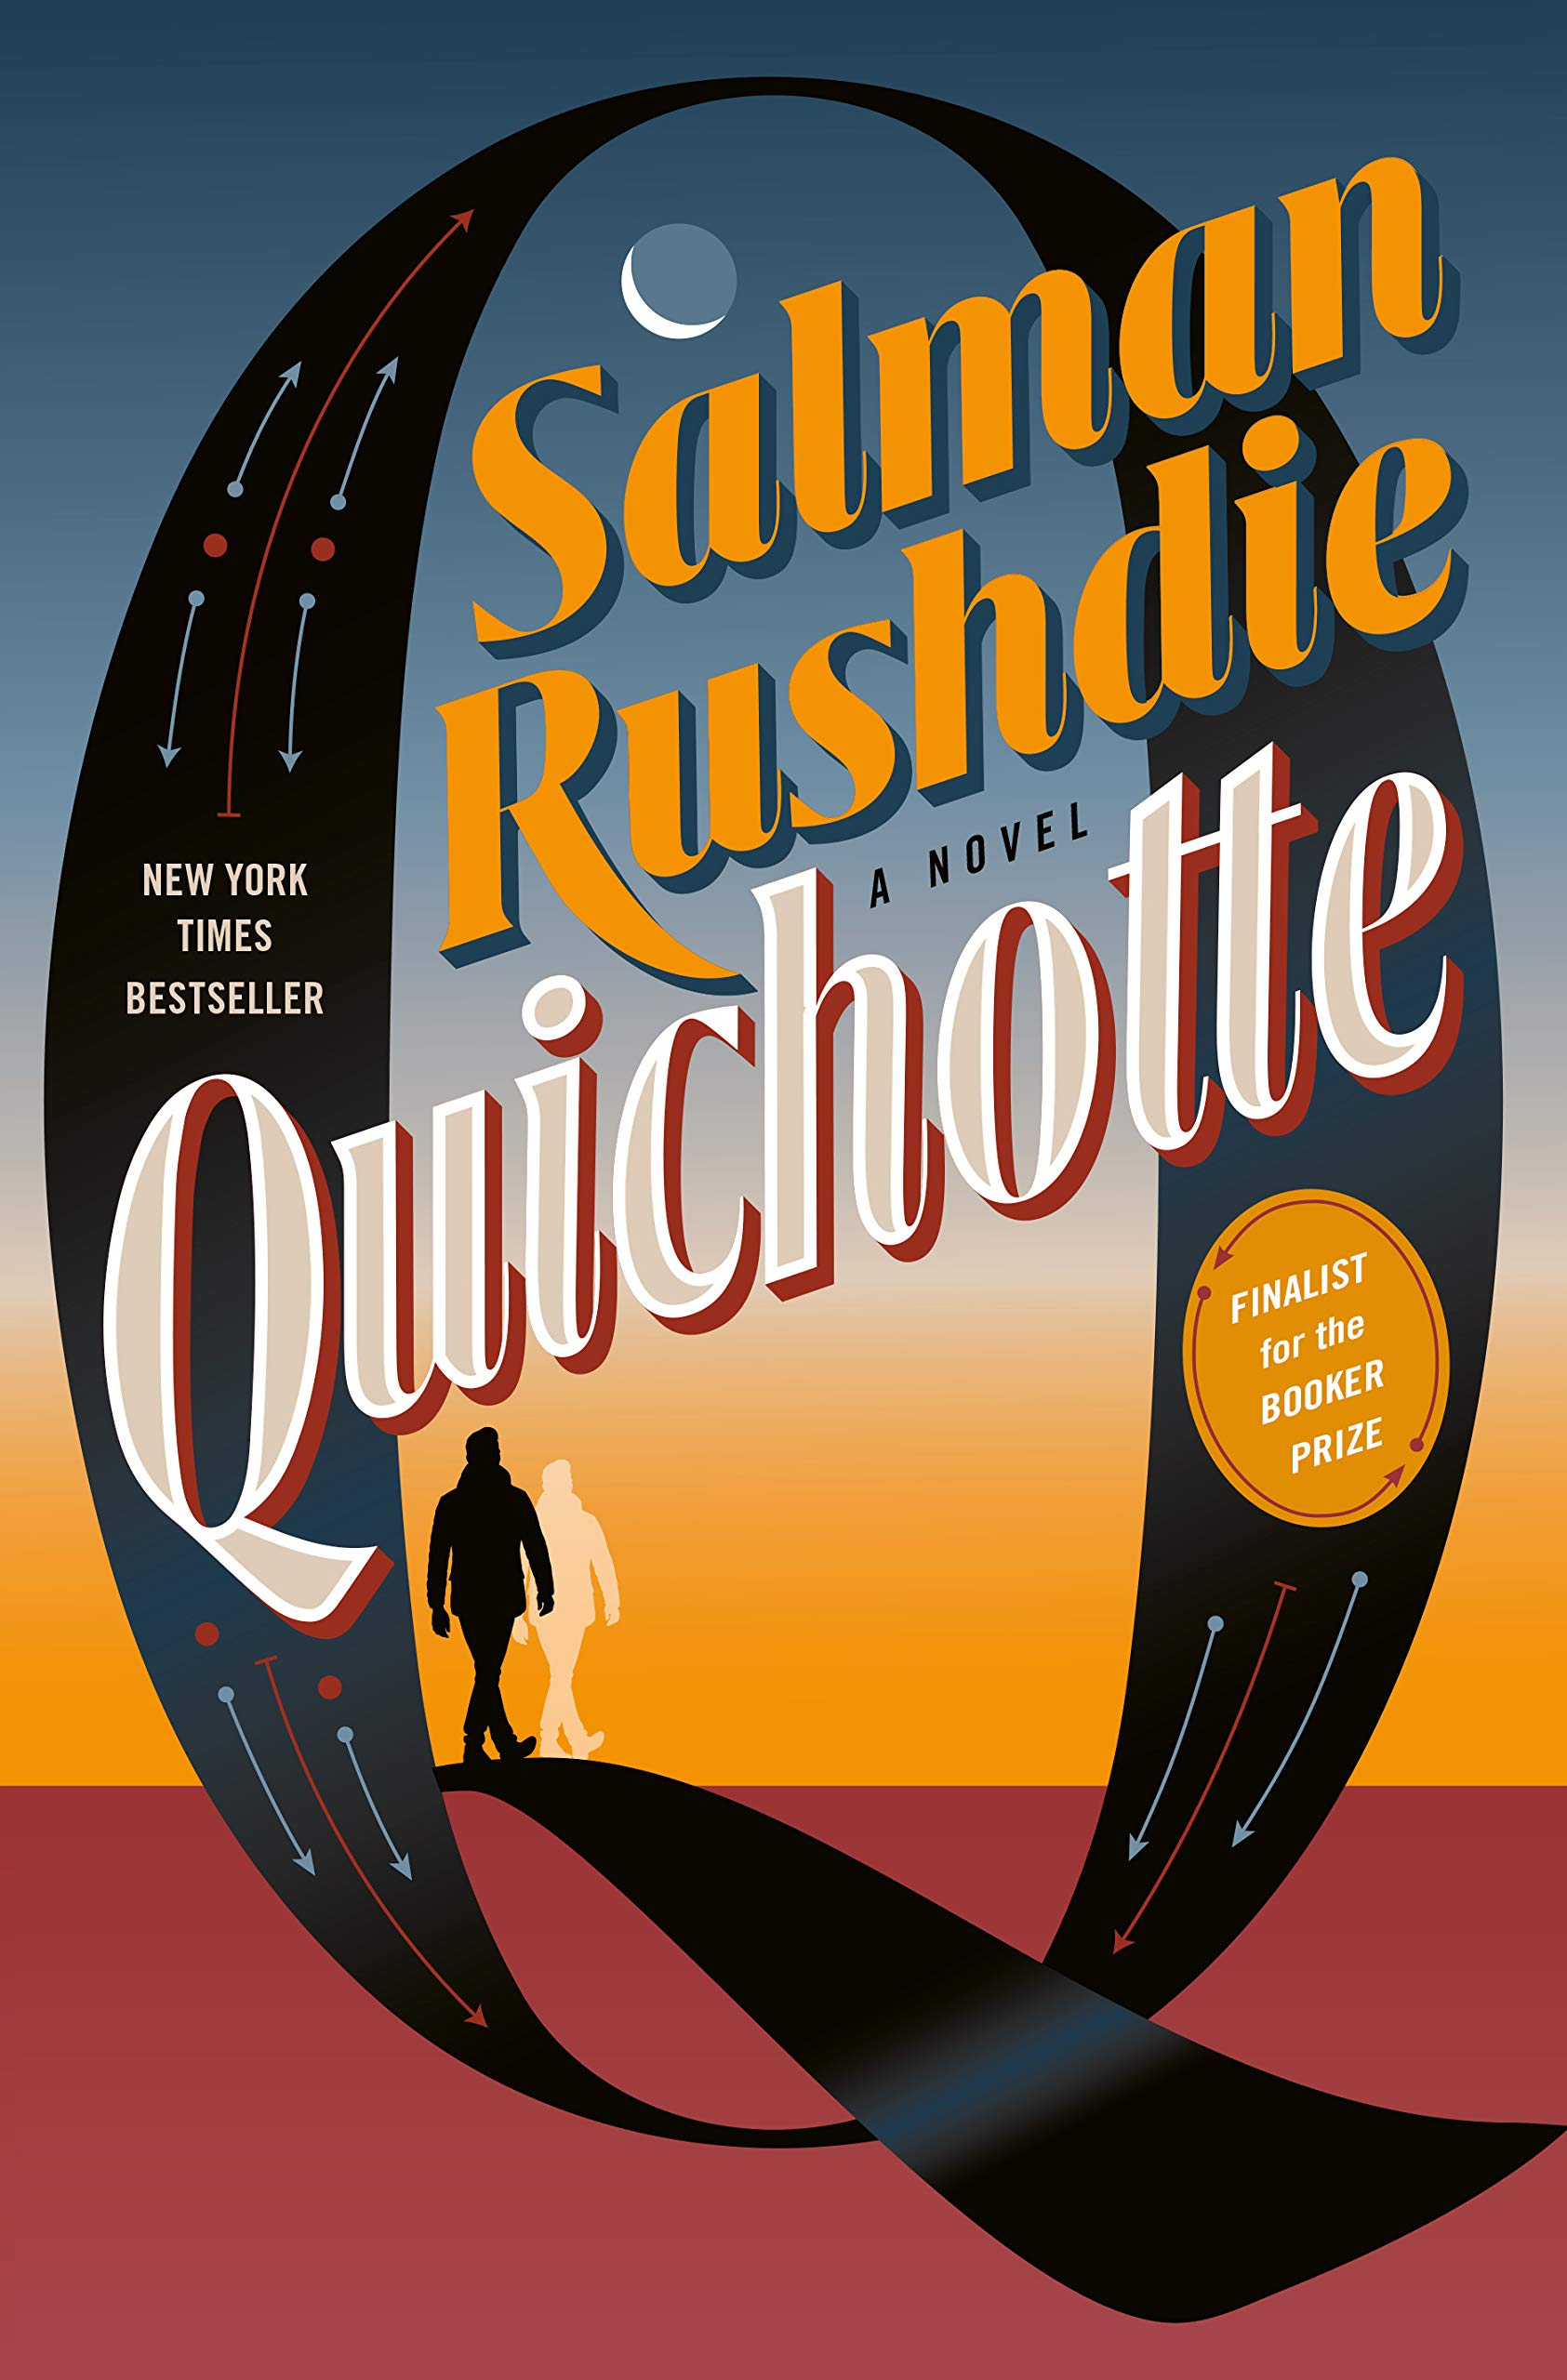 Quichotte: A Novel by Random House